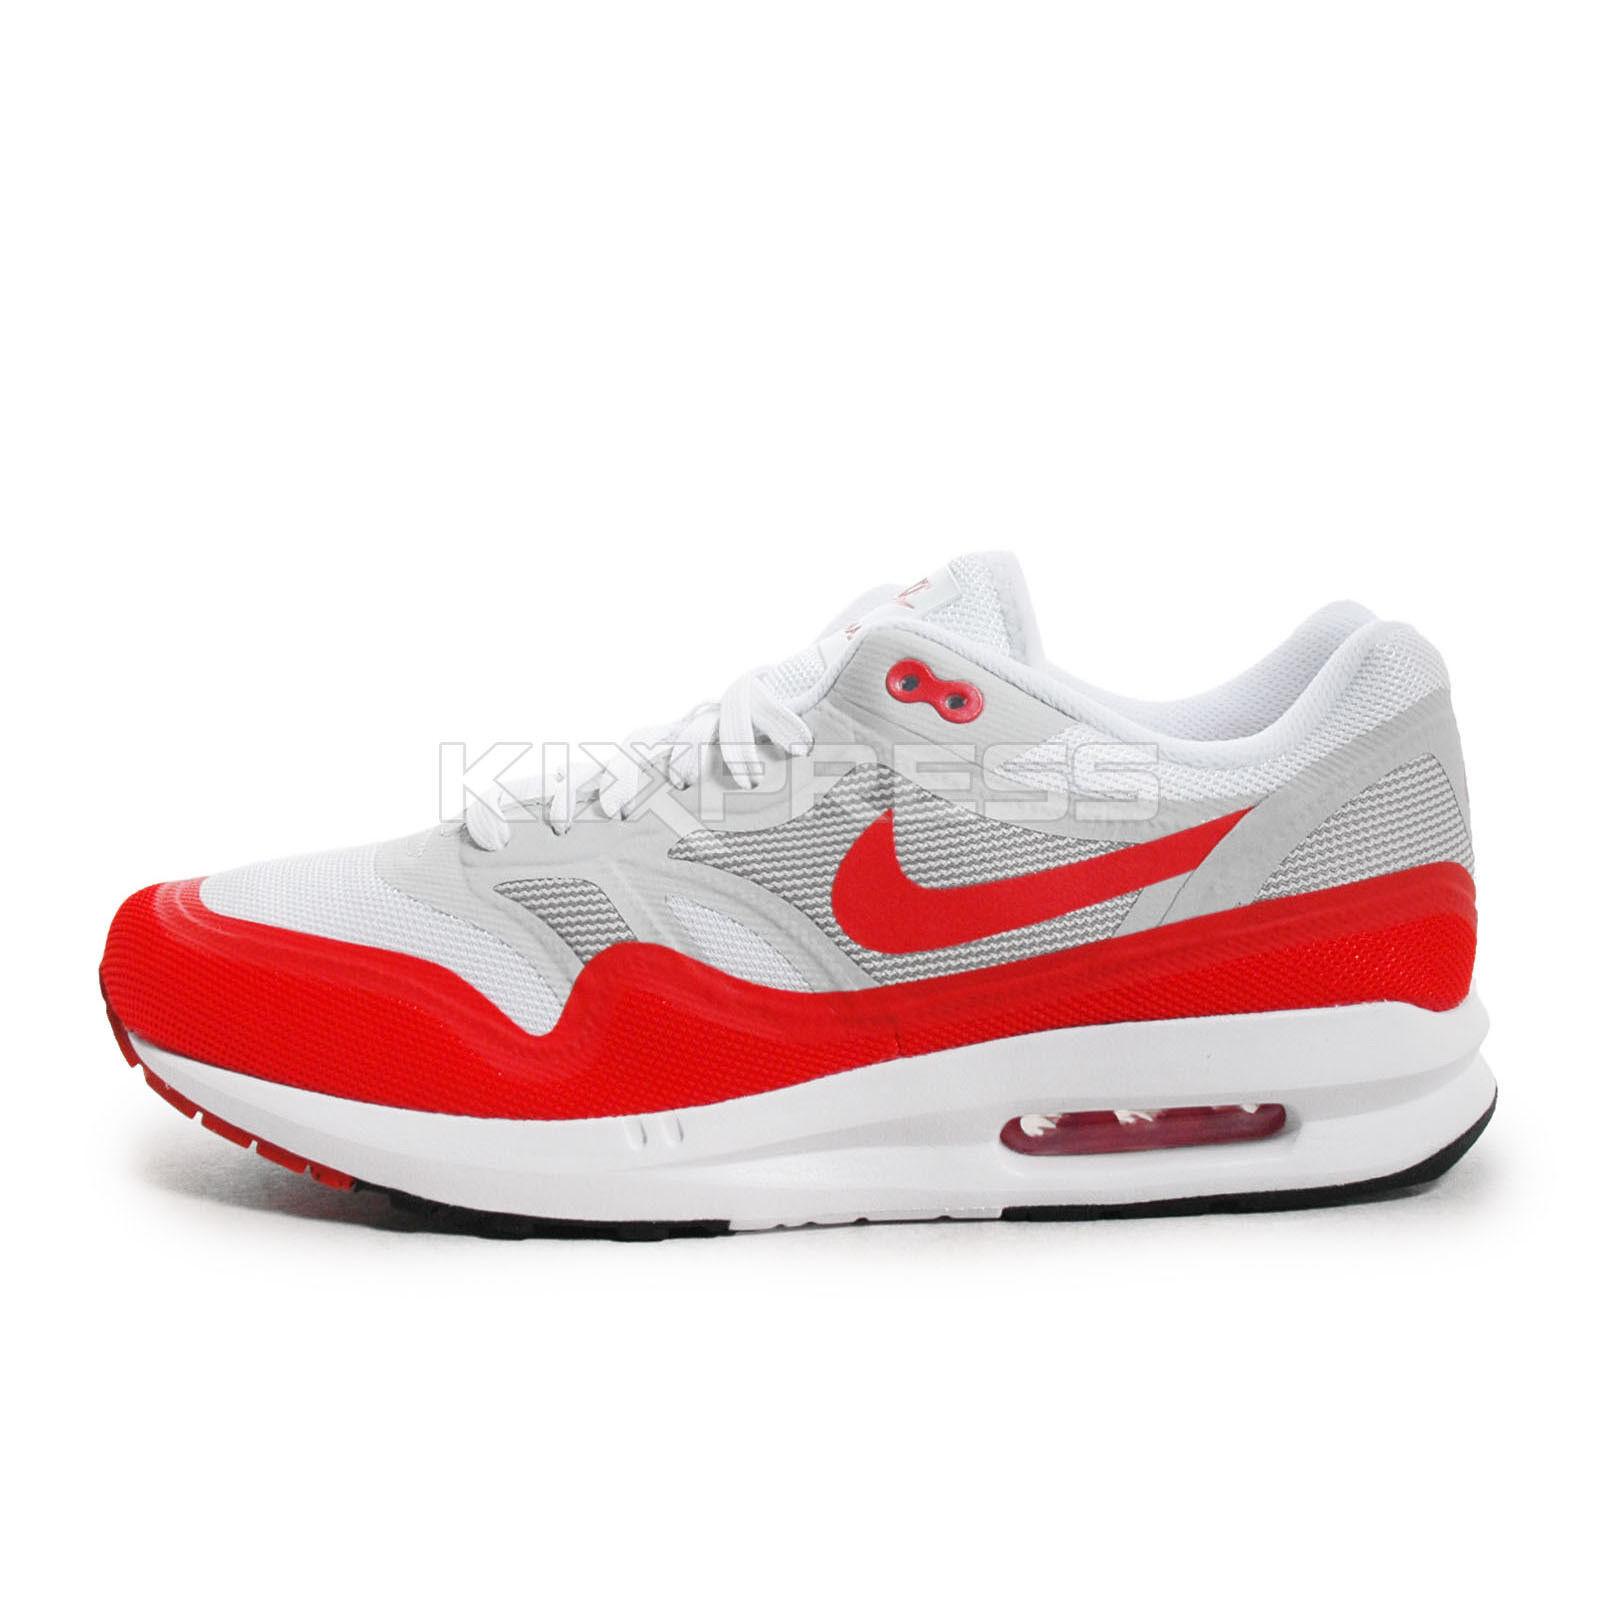 timeless design 49575 99236 Nike Air Max Lunar1  654469-101  NSW Running White Red-Grey